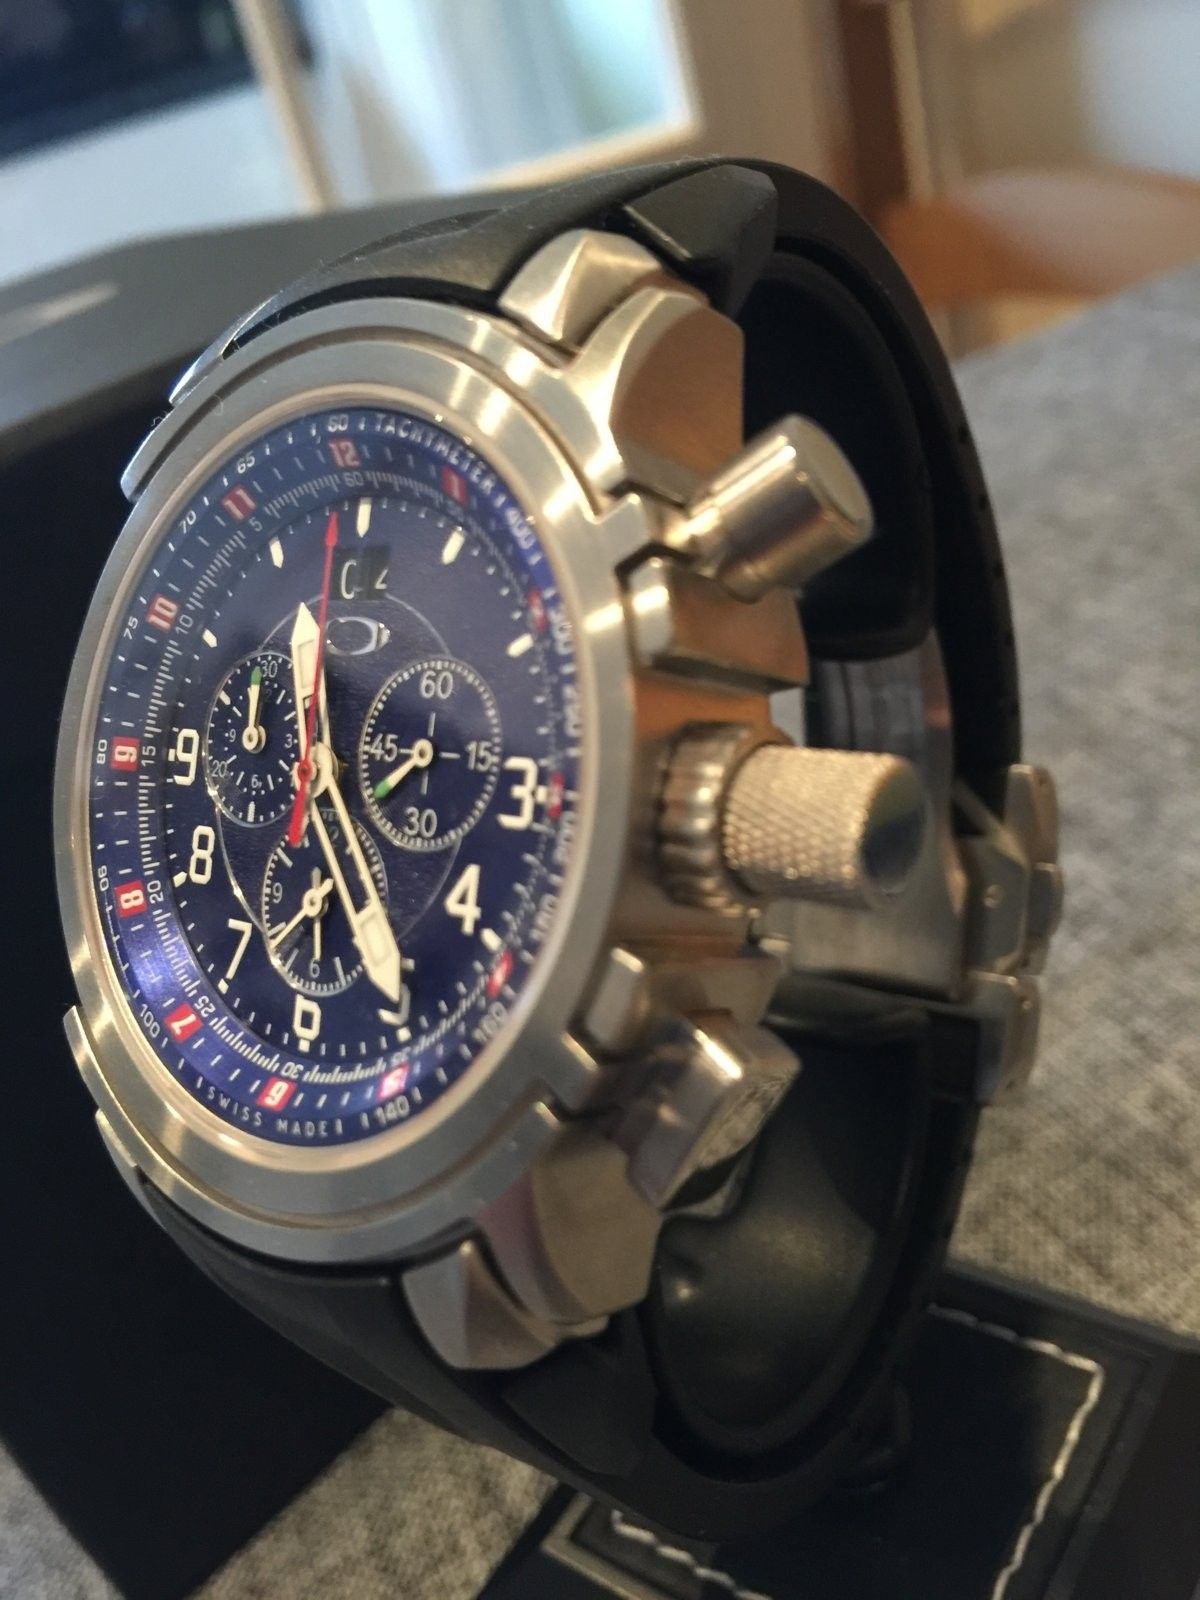 Or trade 12 gauge blue face new - image.jpeg